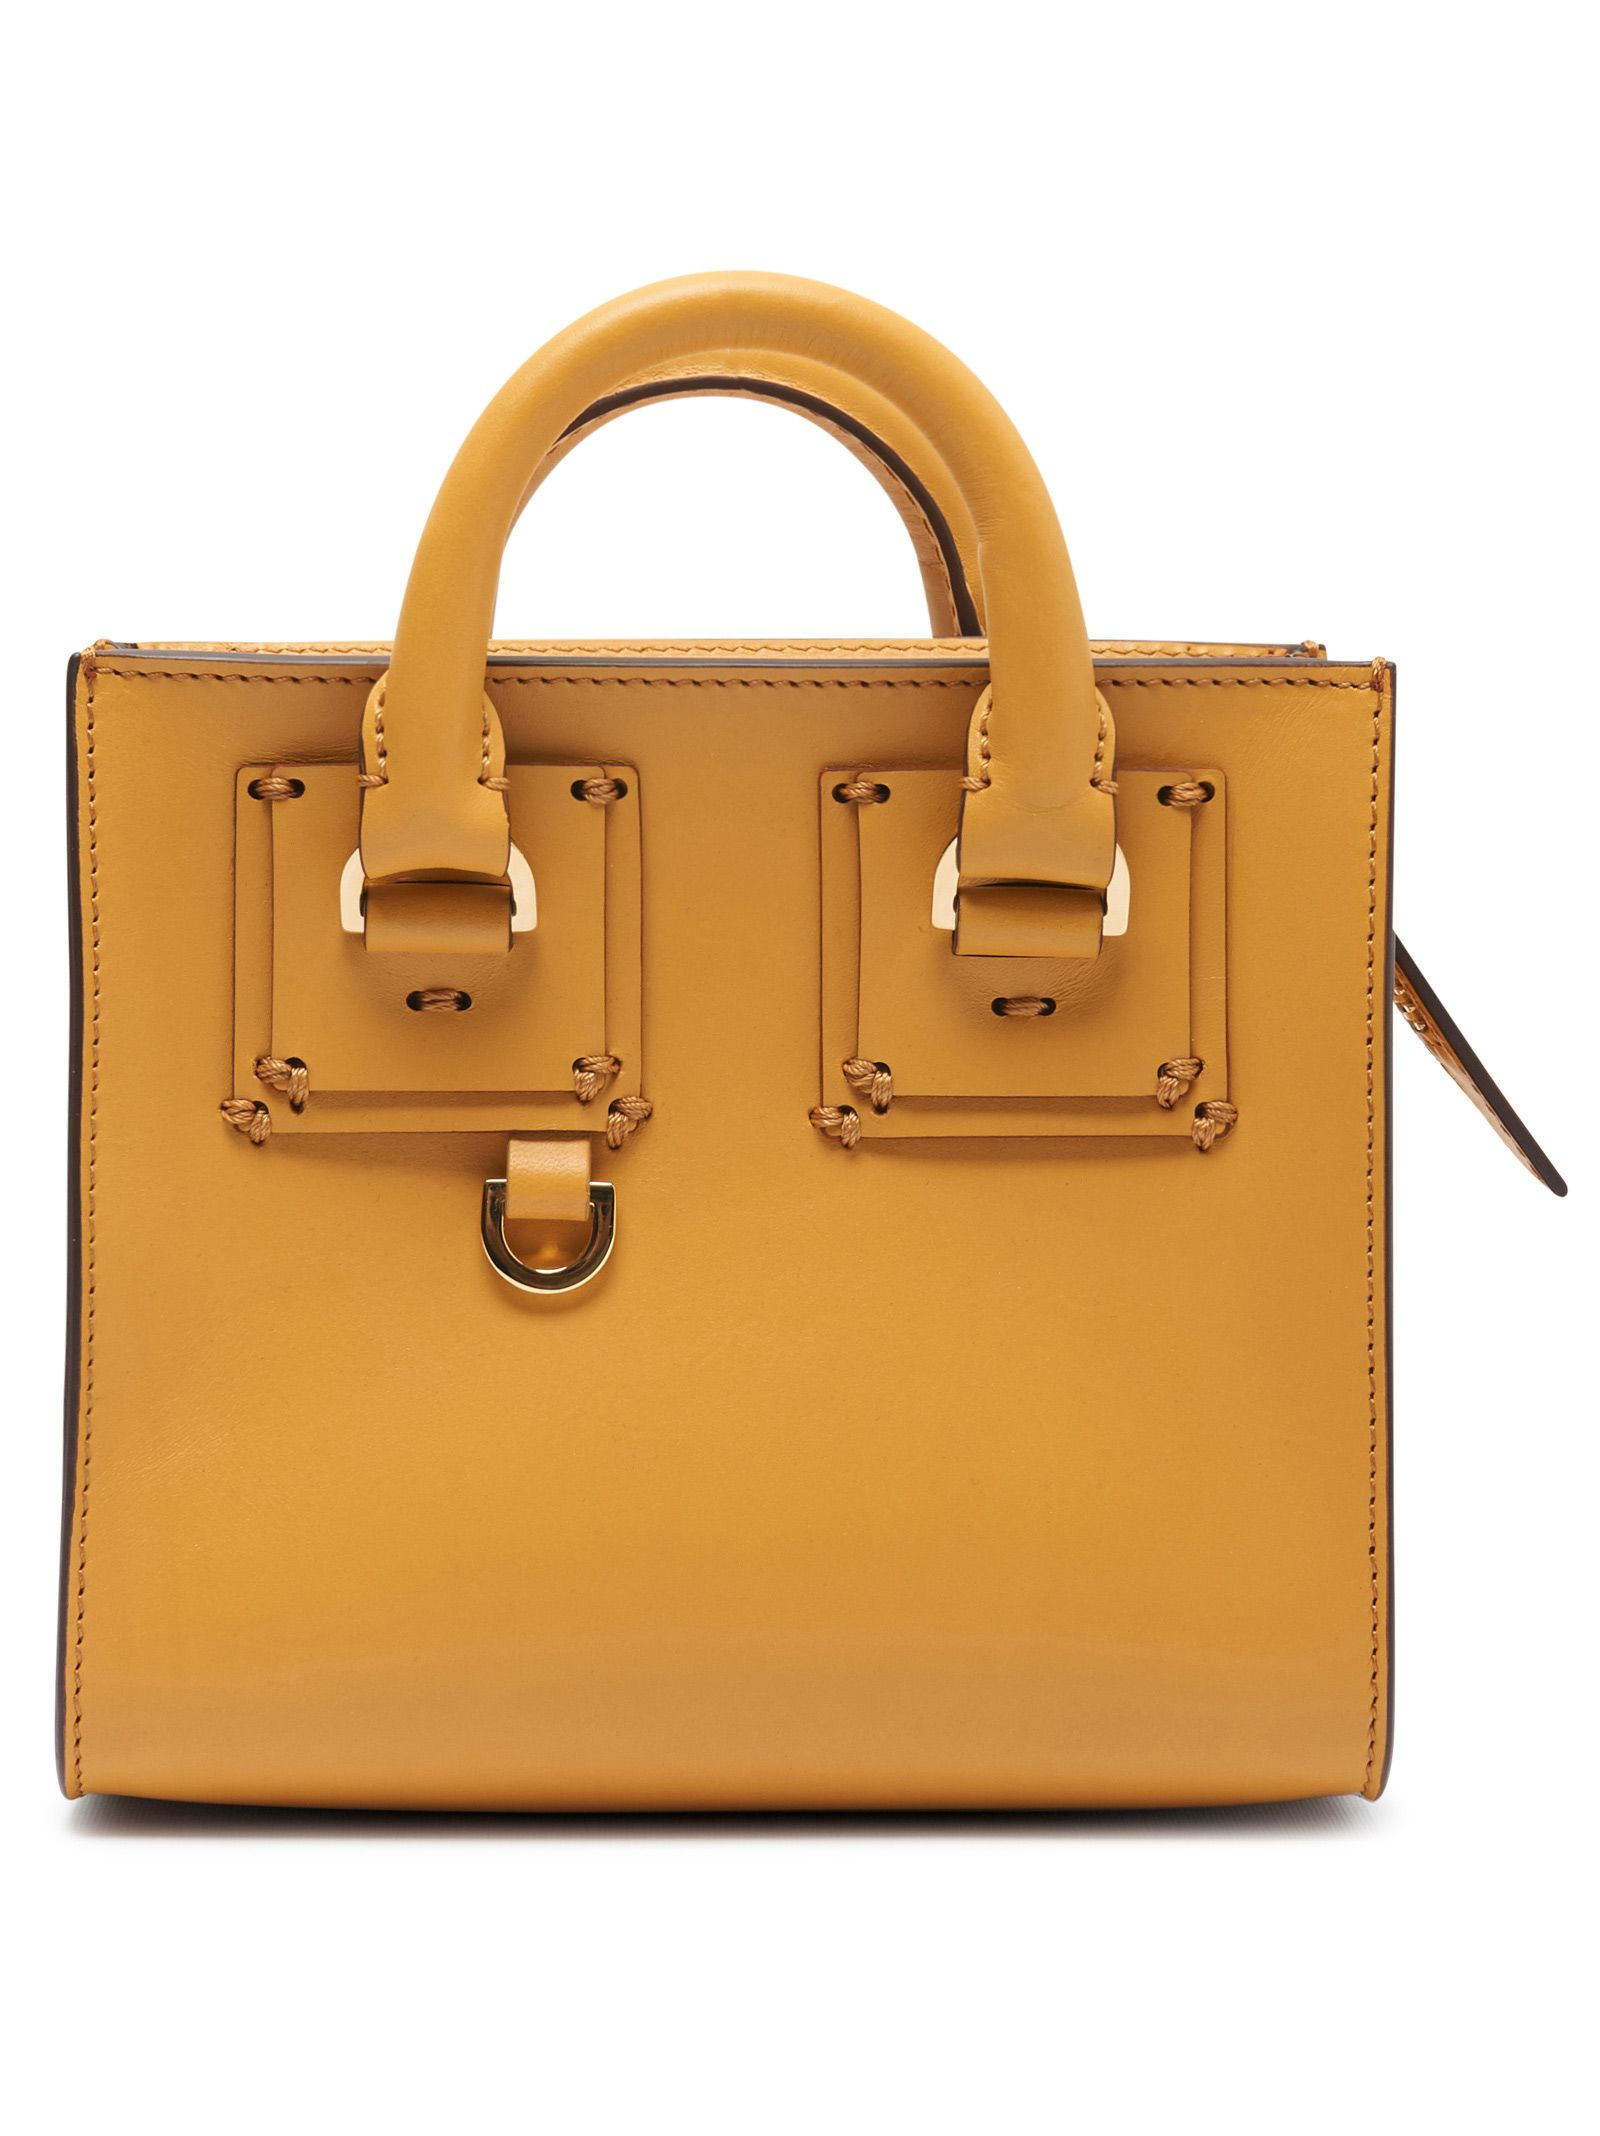 Sophie Hulme Albion Box Tote Bag In Senape  50129947a0b9c